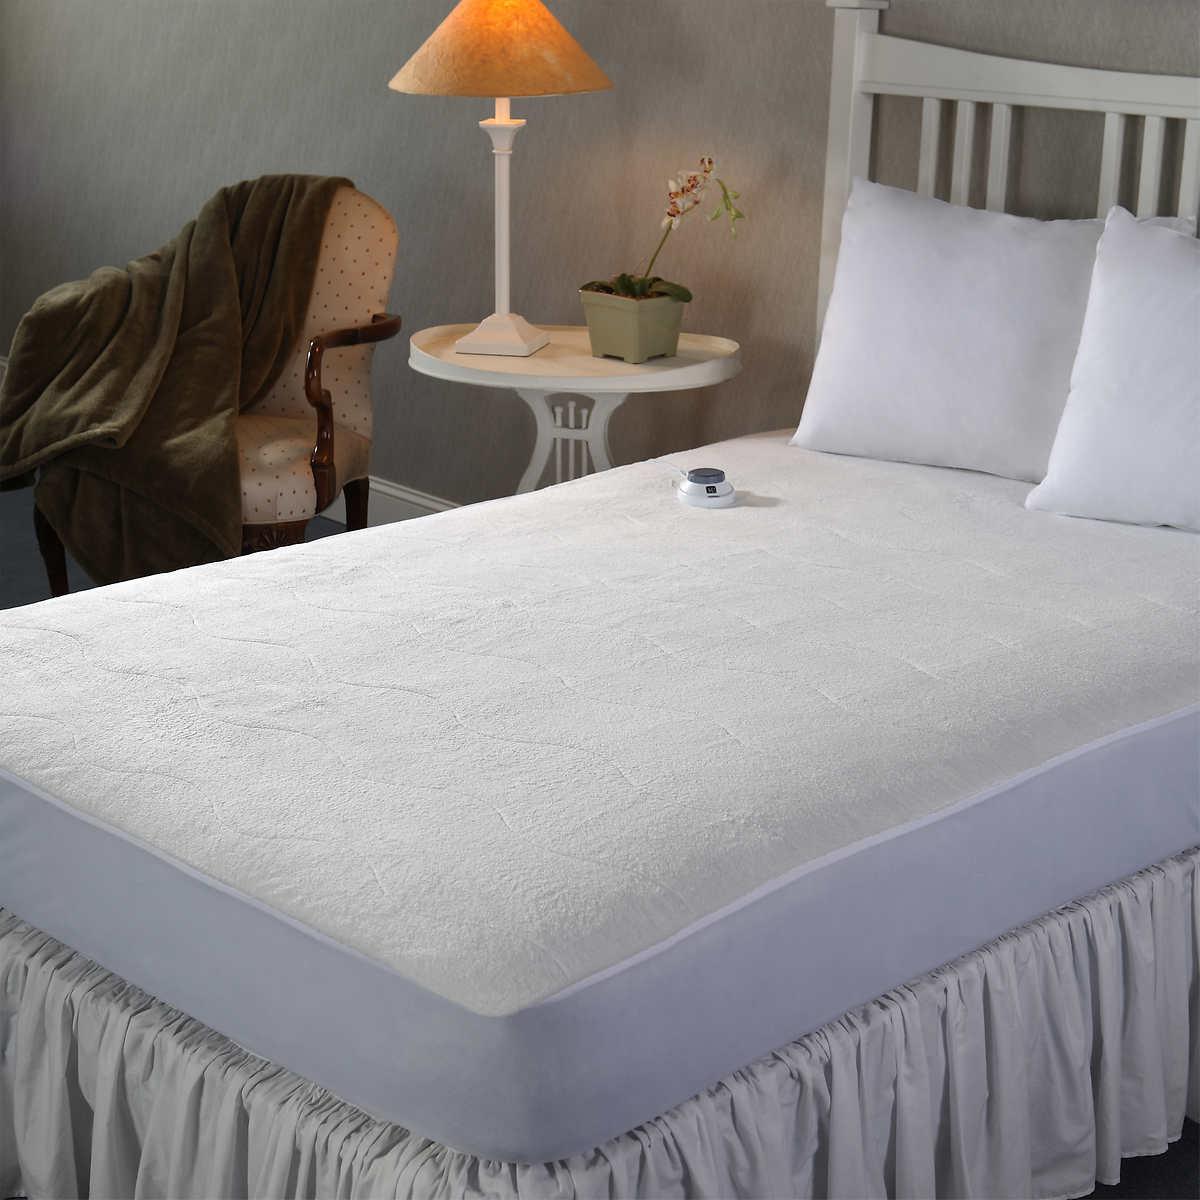 Sunbeam heated mattress pad